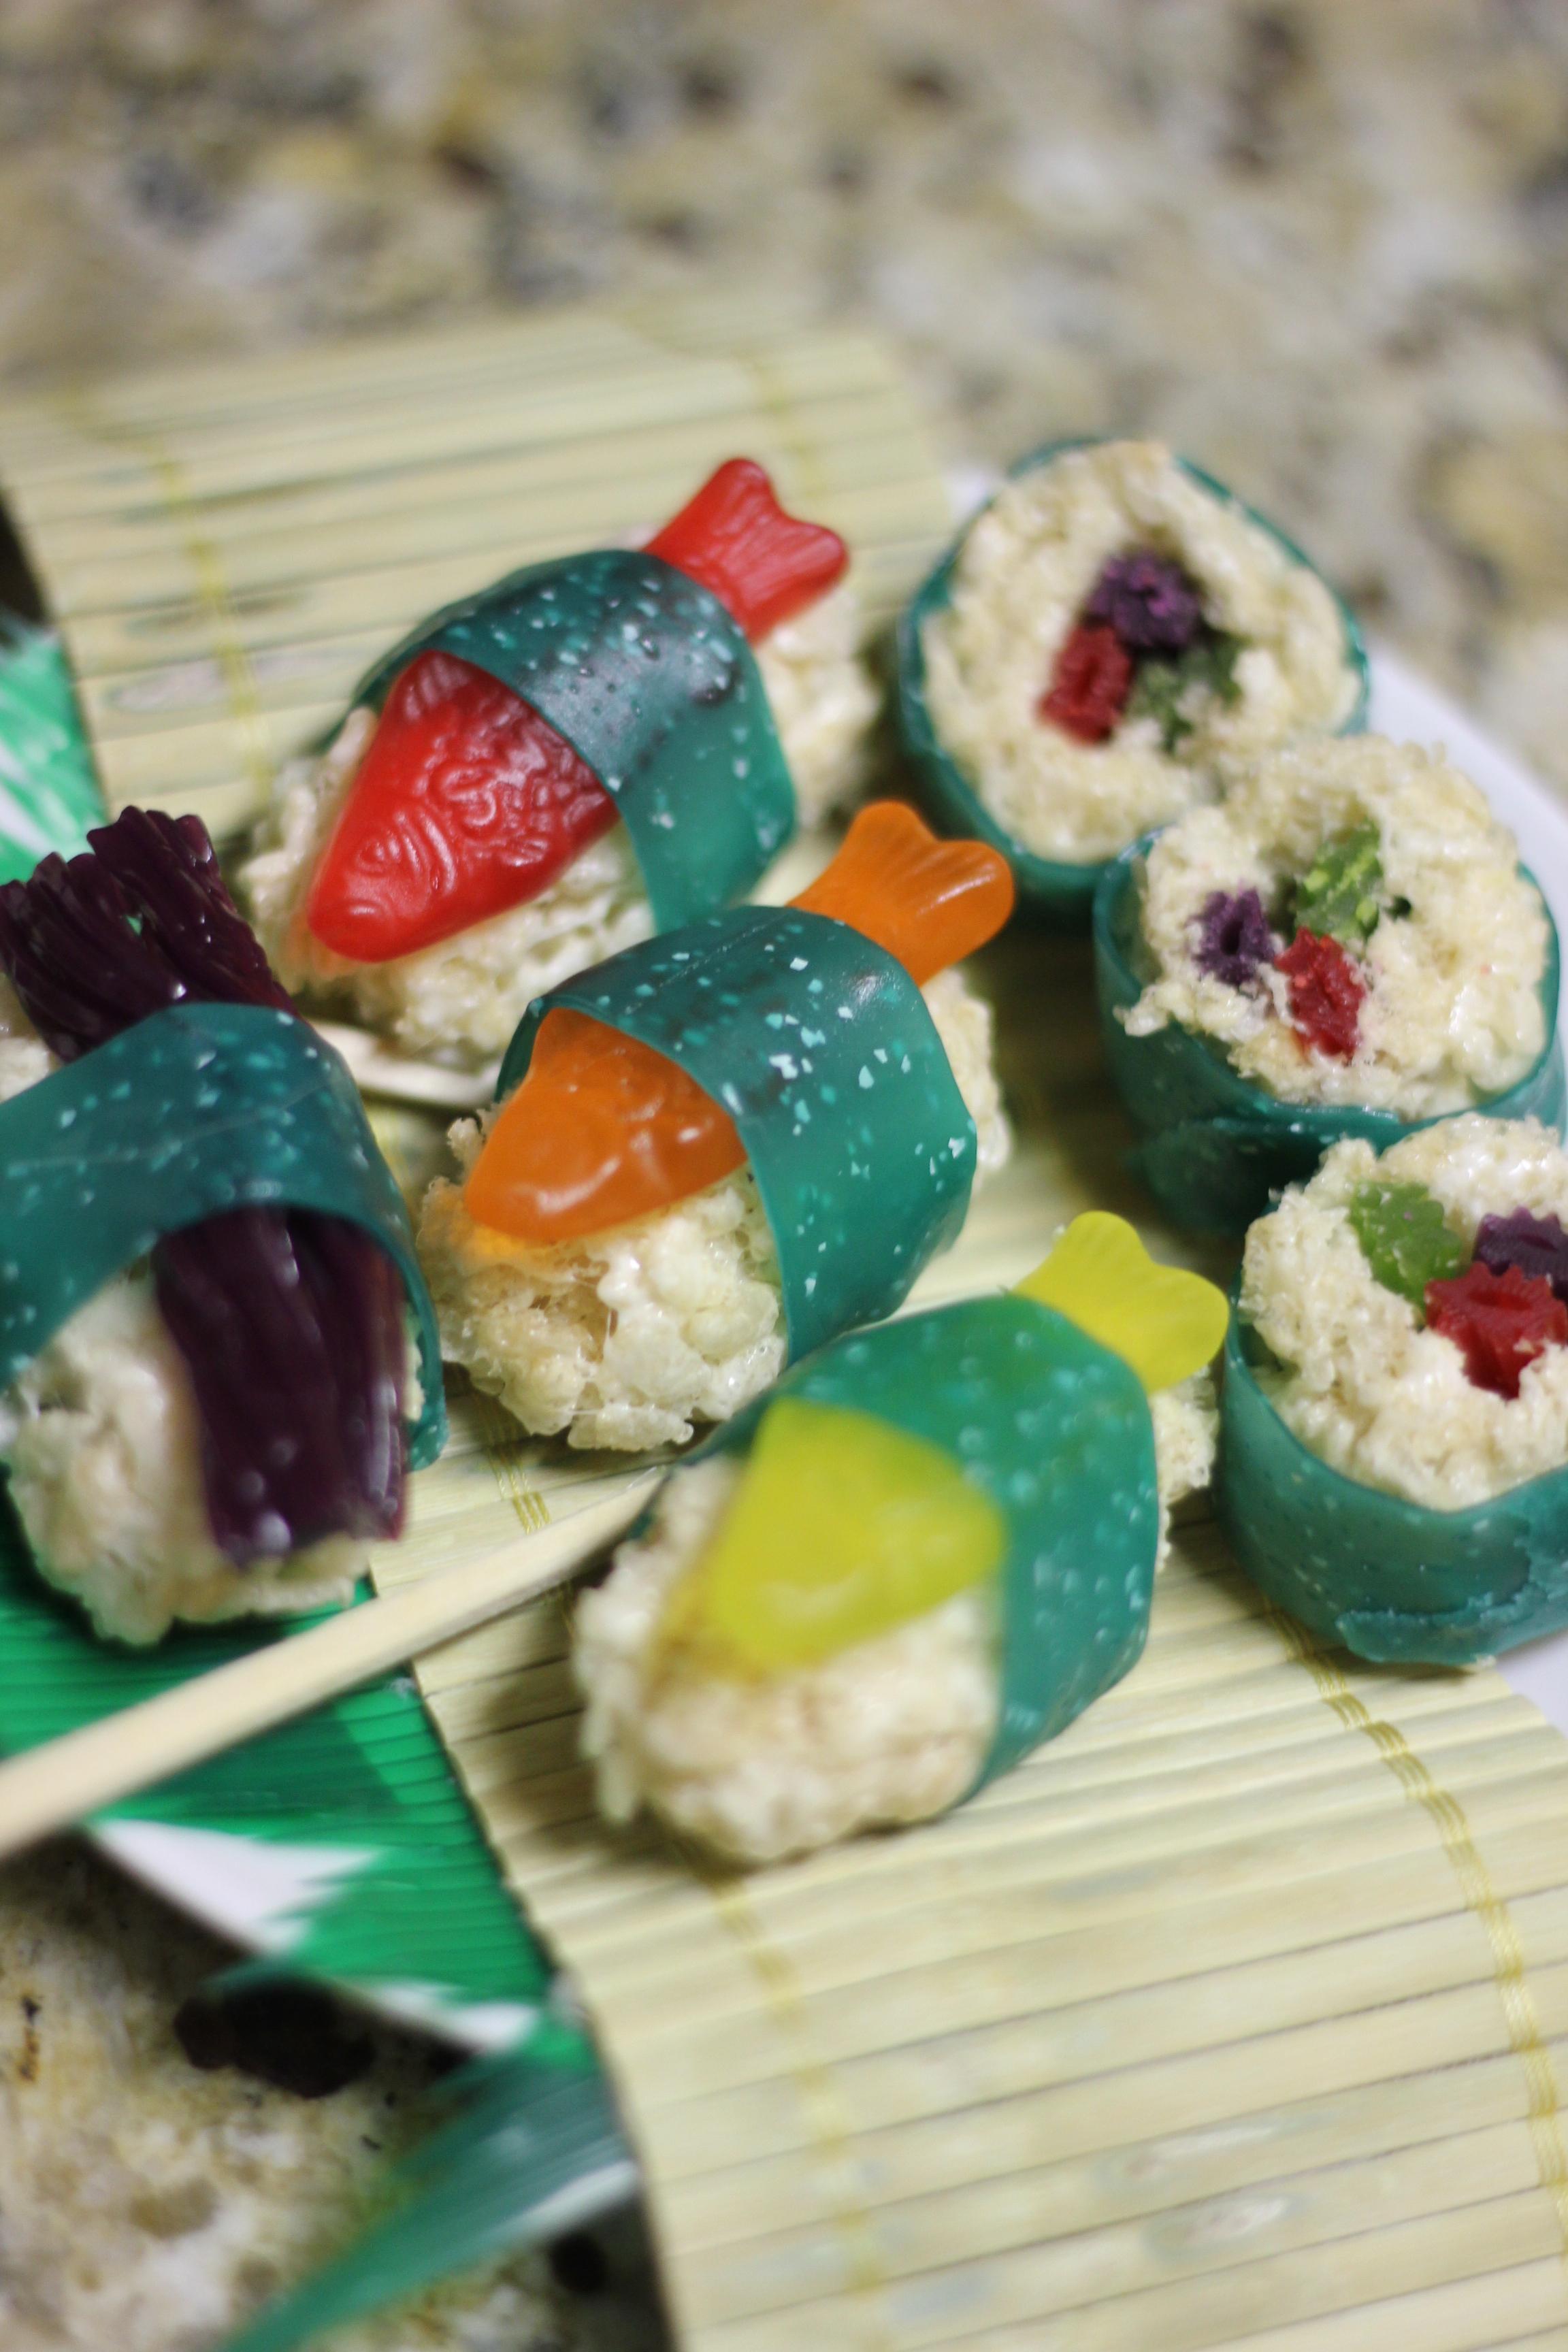 Candy Sushi! Swedish fish, Fruit roll ups, Twizzlers, rice krispie treats! Delic